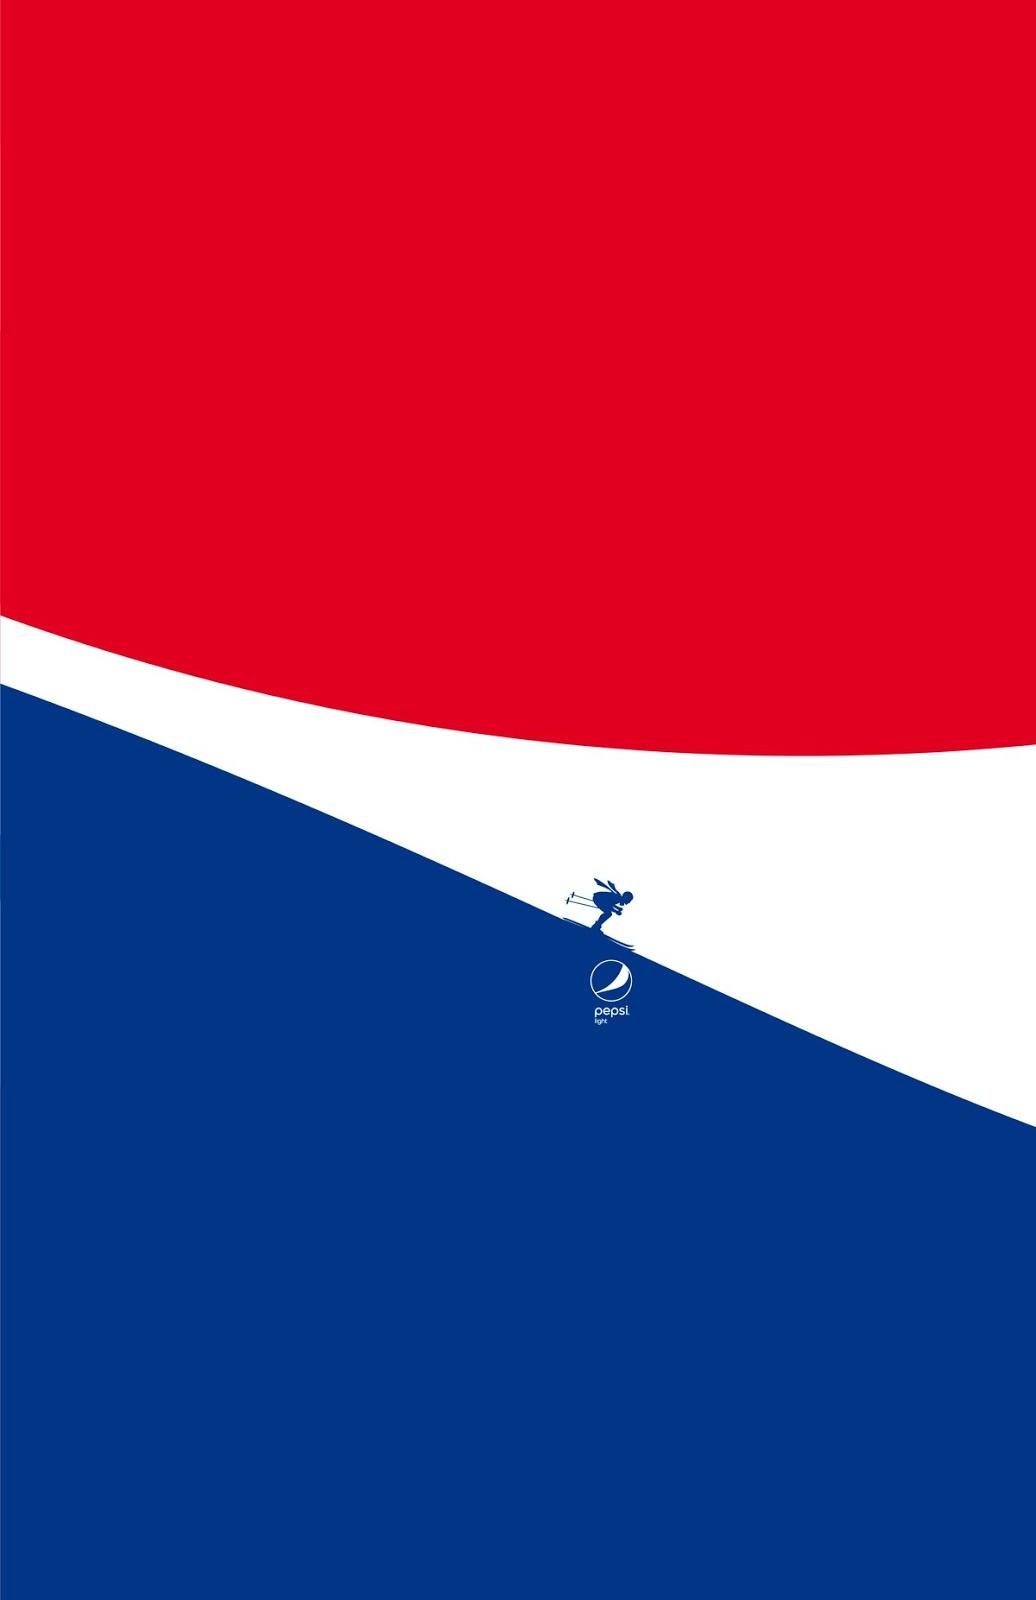 campaña-publicitaria-pepsi-light-deportes-logotipo